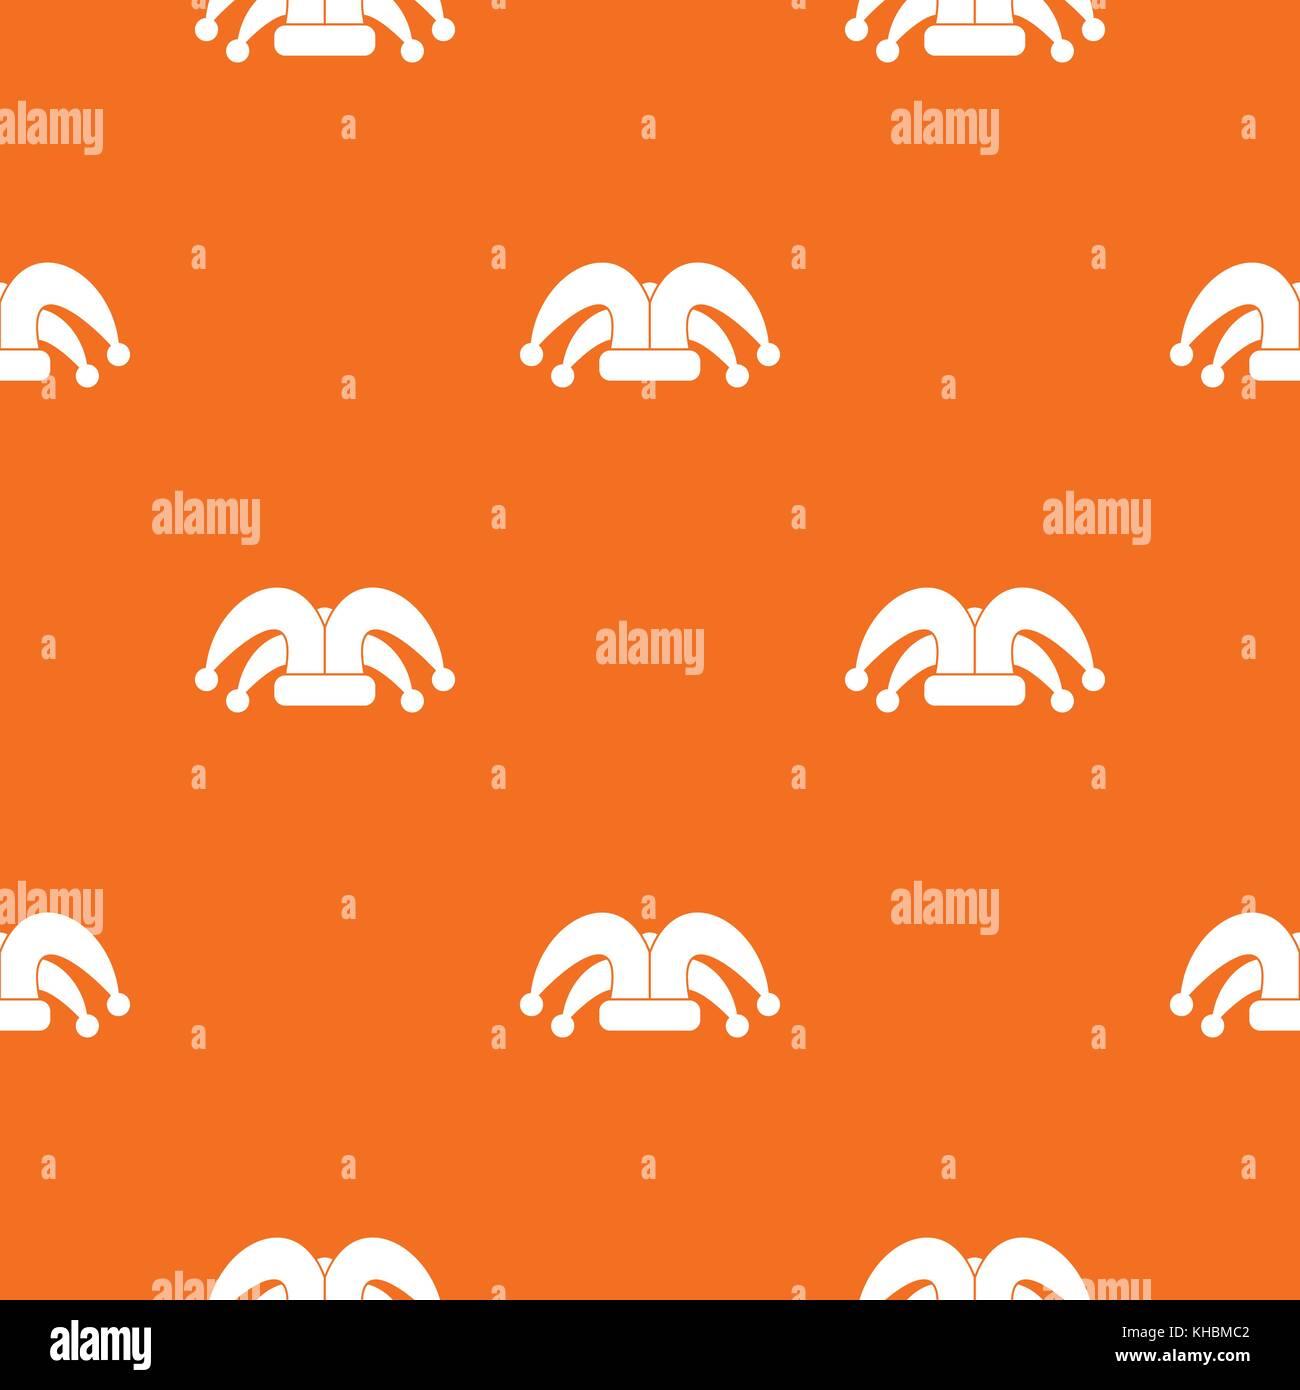 Clown hat pattern seamless Stock Vector Art   Illustration d2cccb700c1